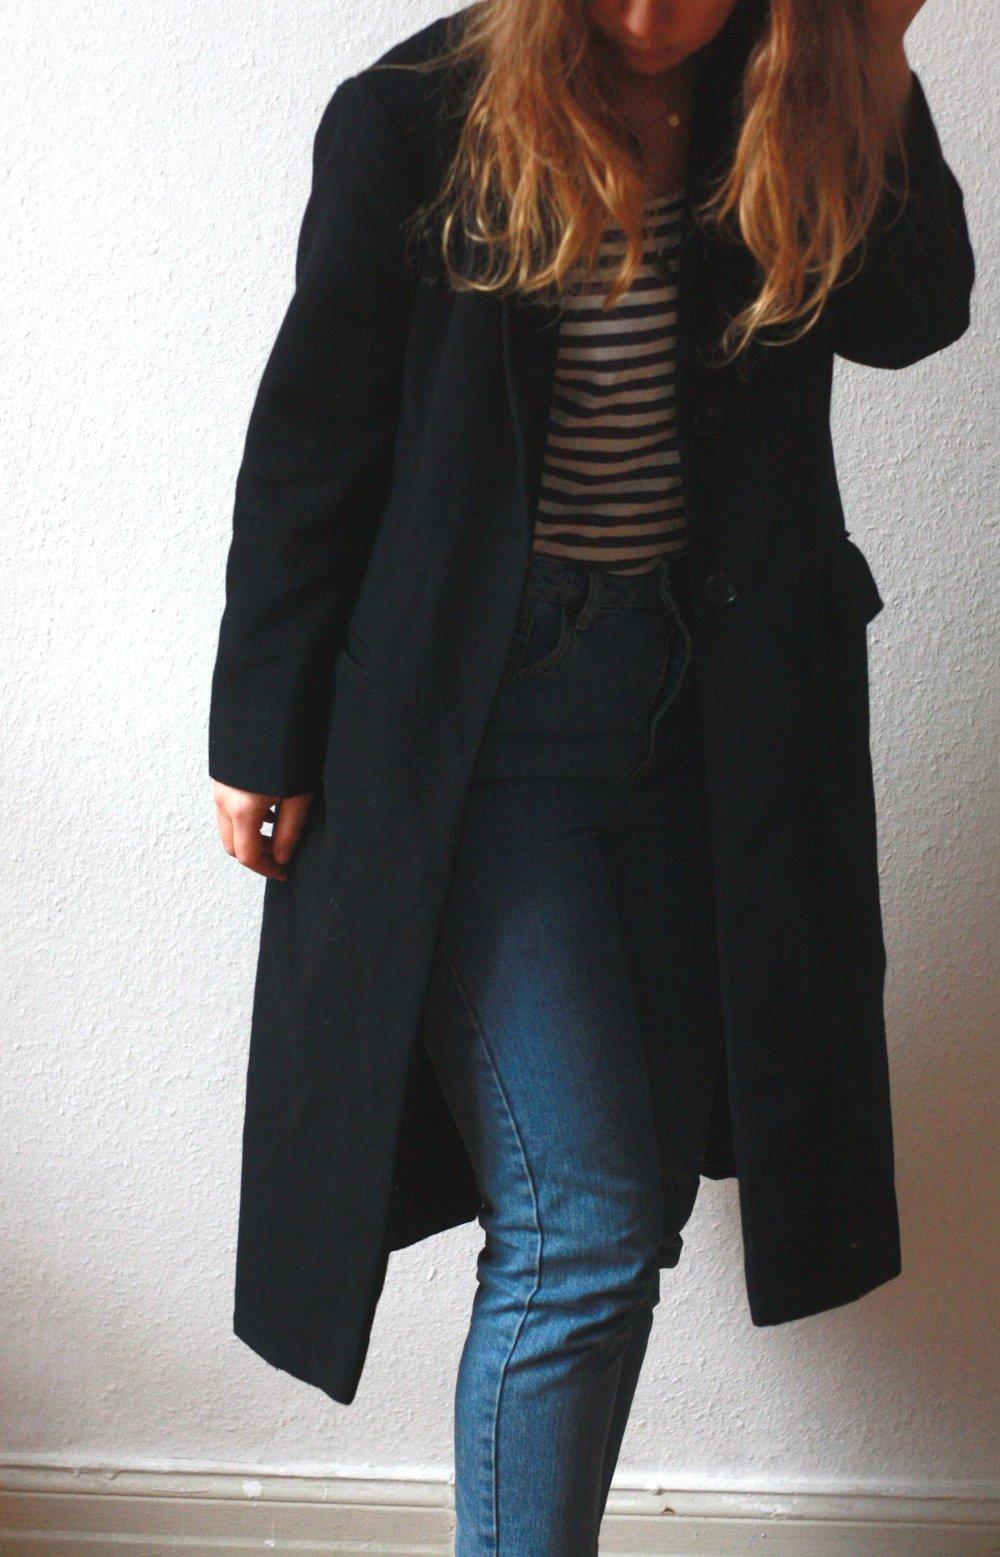 NEU ZARA STEPPJACKE Übergangsjacke Mantel Blazer Blogger M